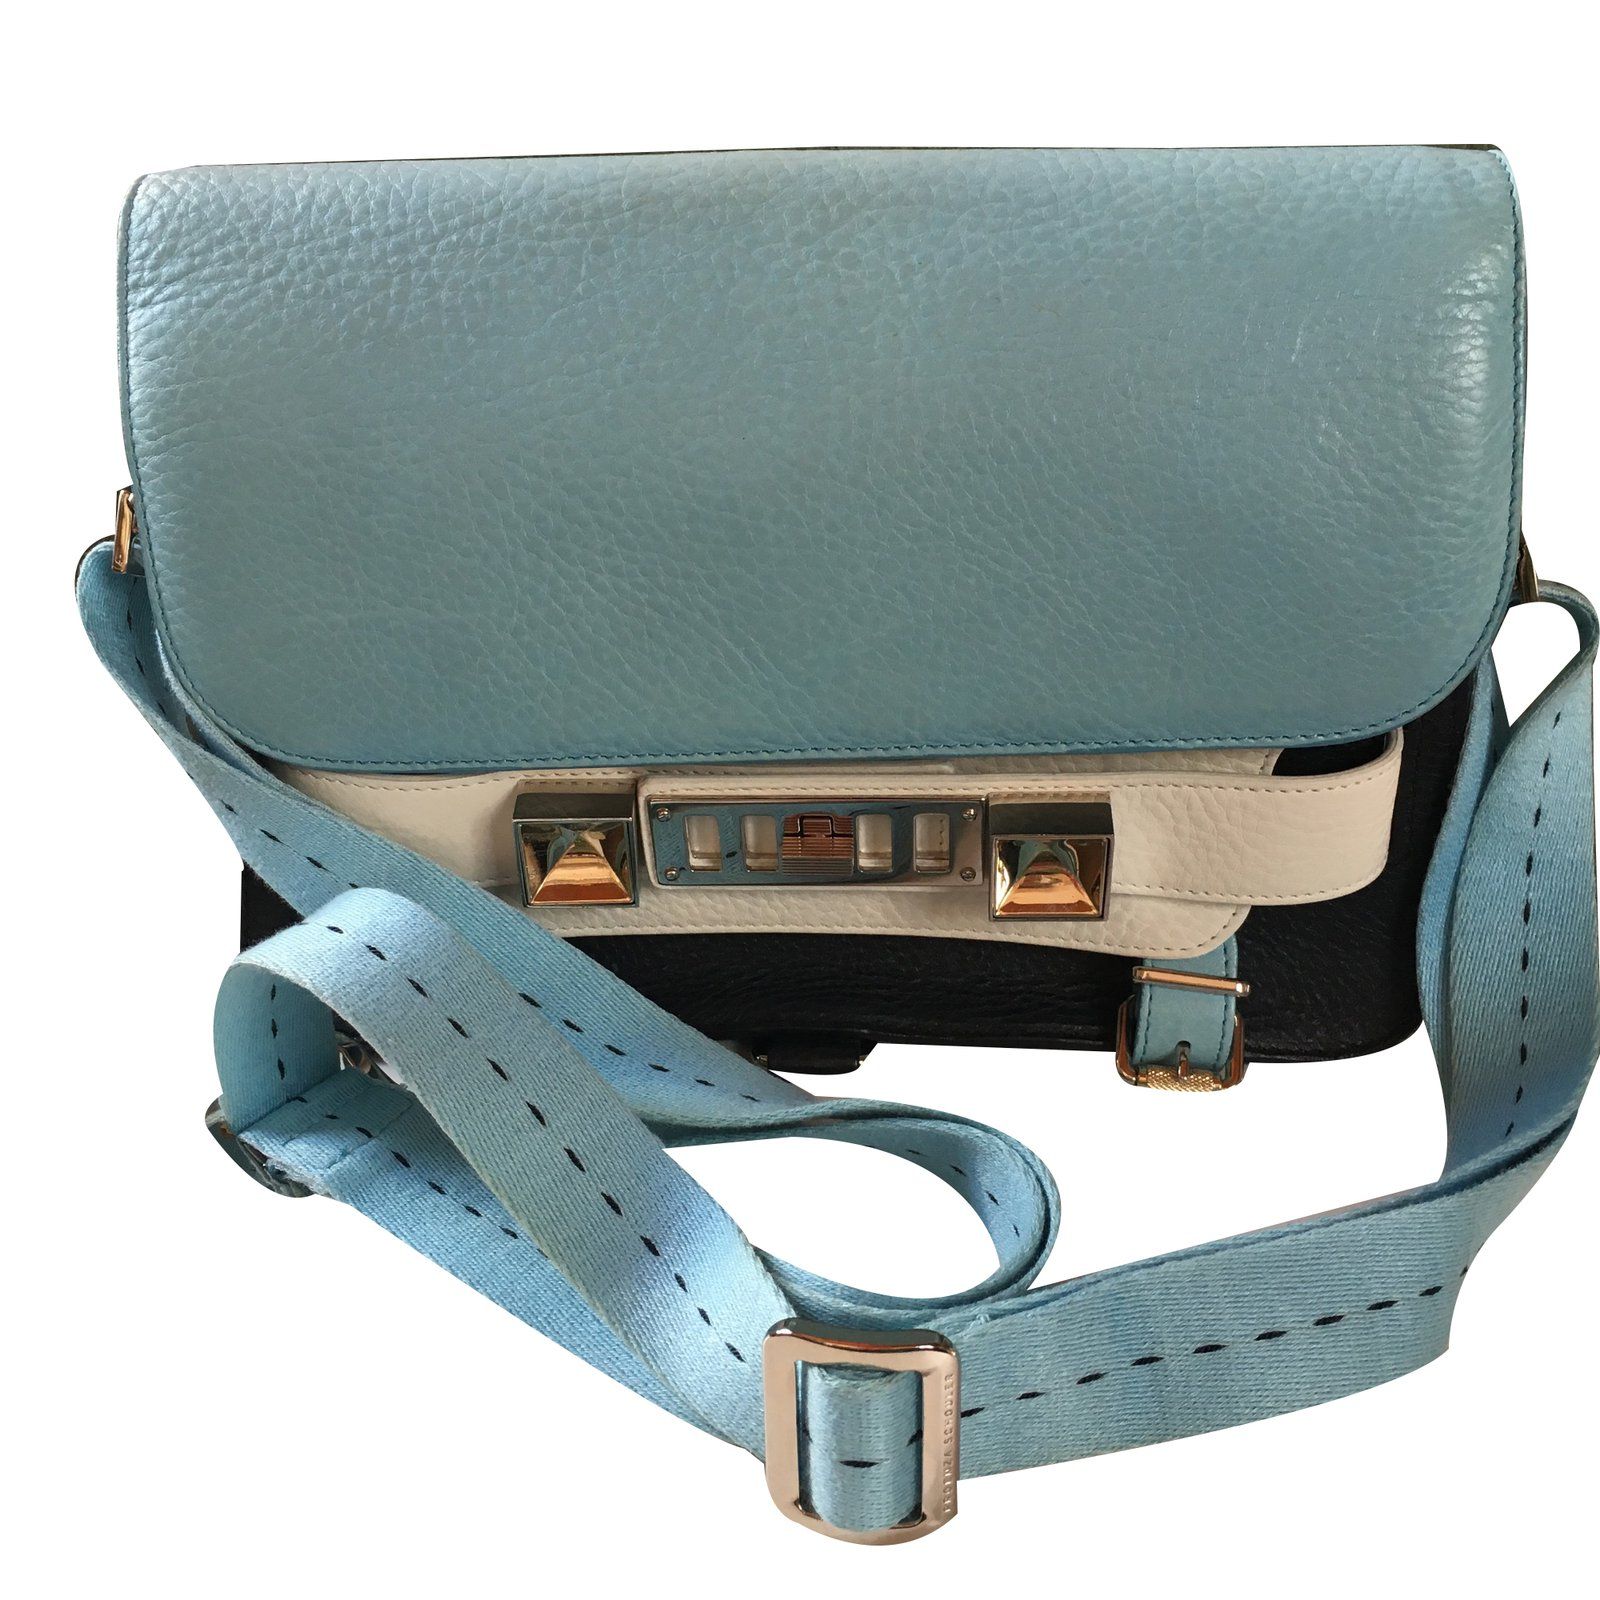 Proenza Schouler Ps 11 Handbags Leather Multiple Colors Ref 36908